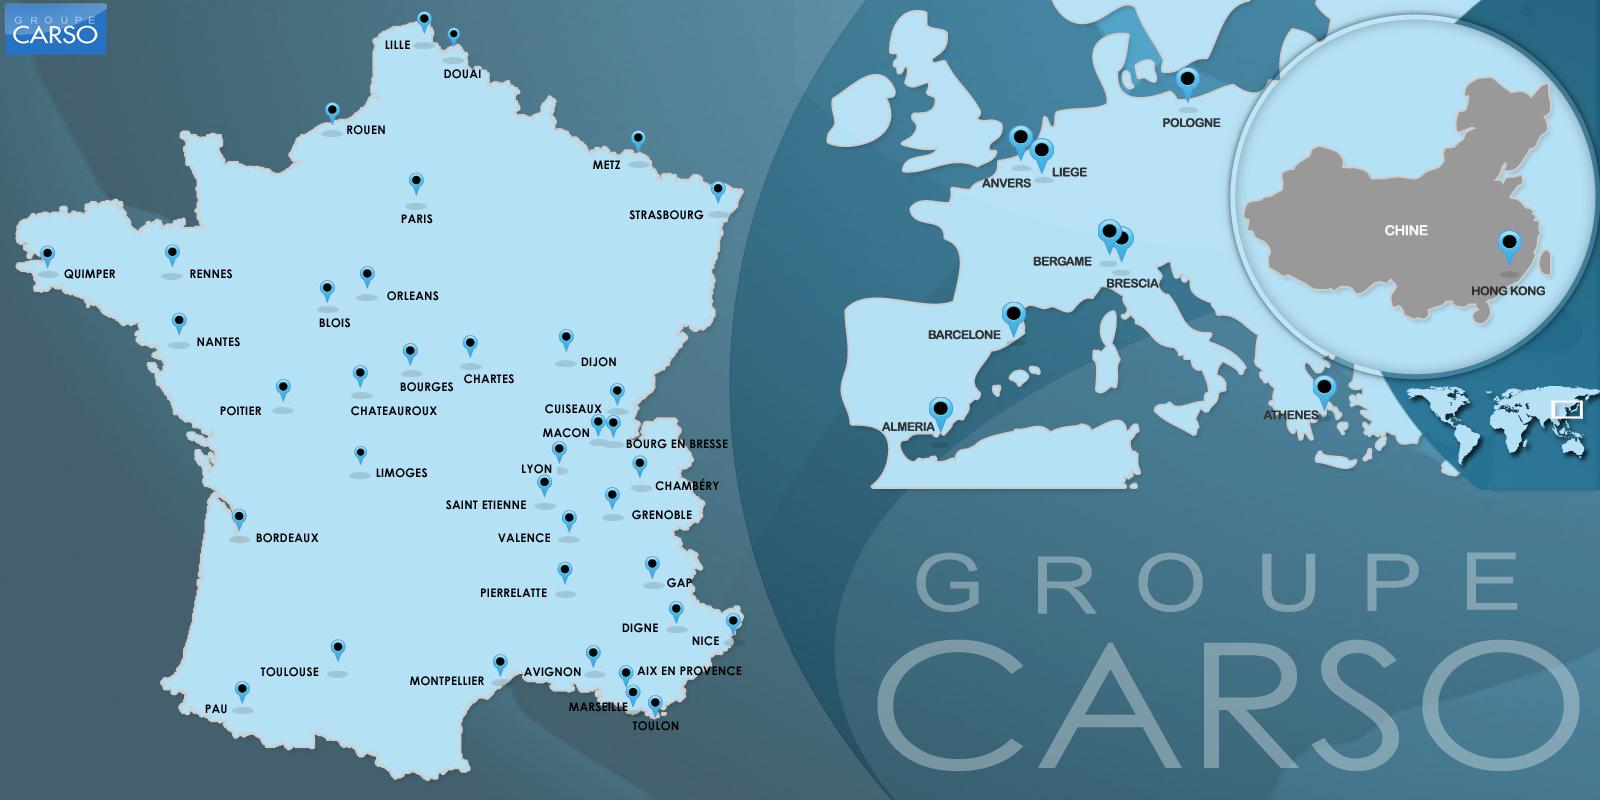 Implantations Groupe Carso